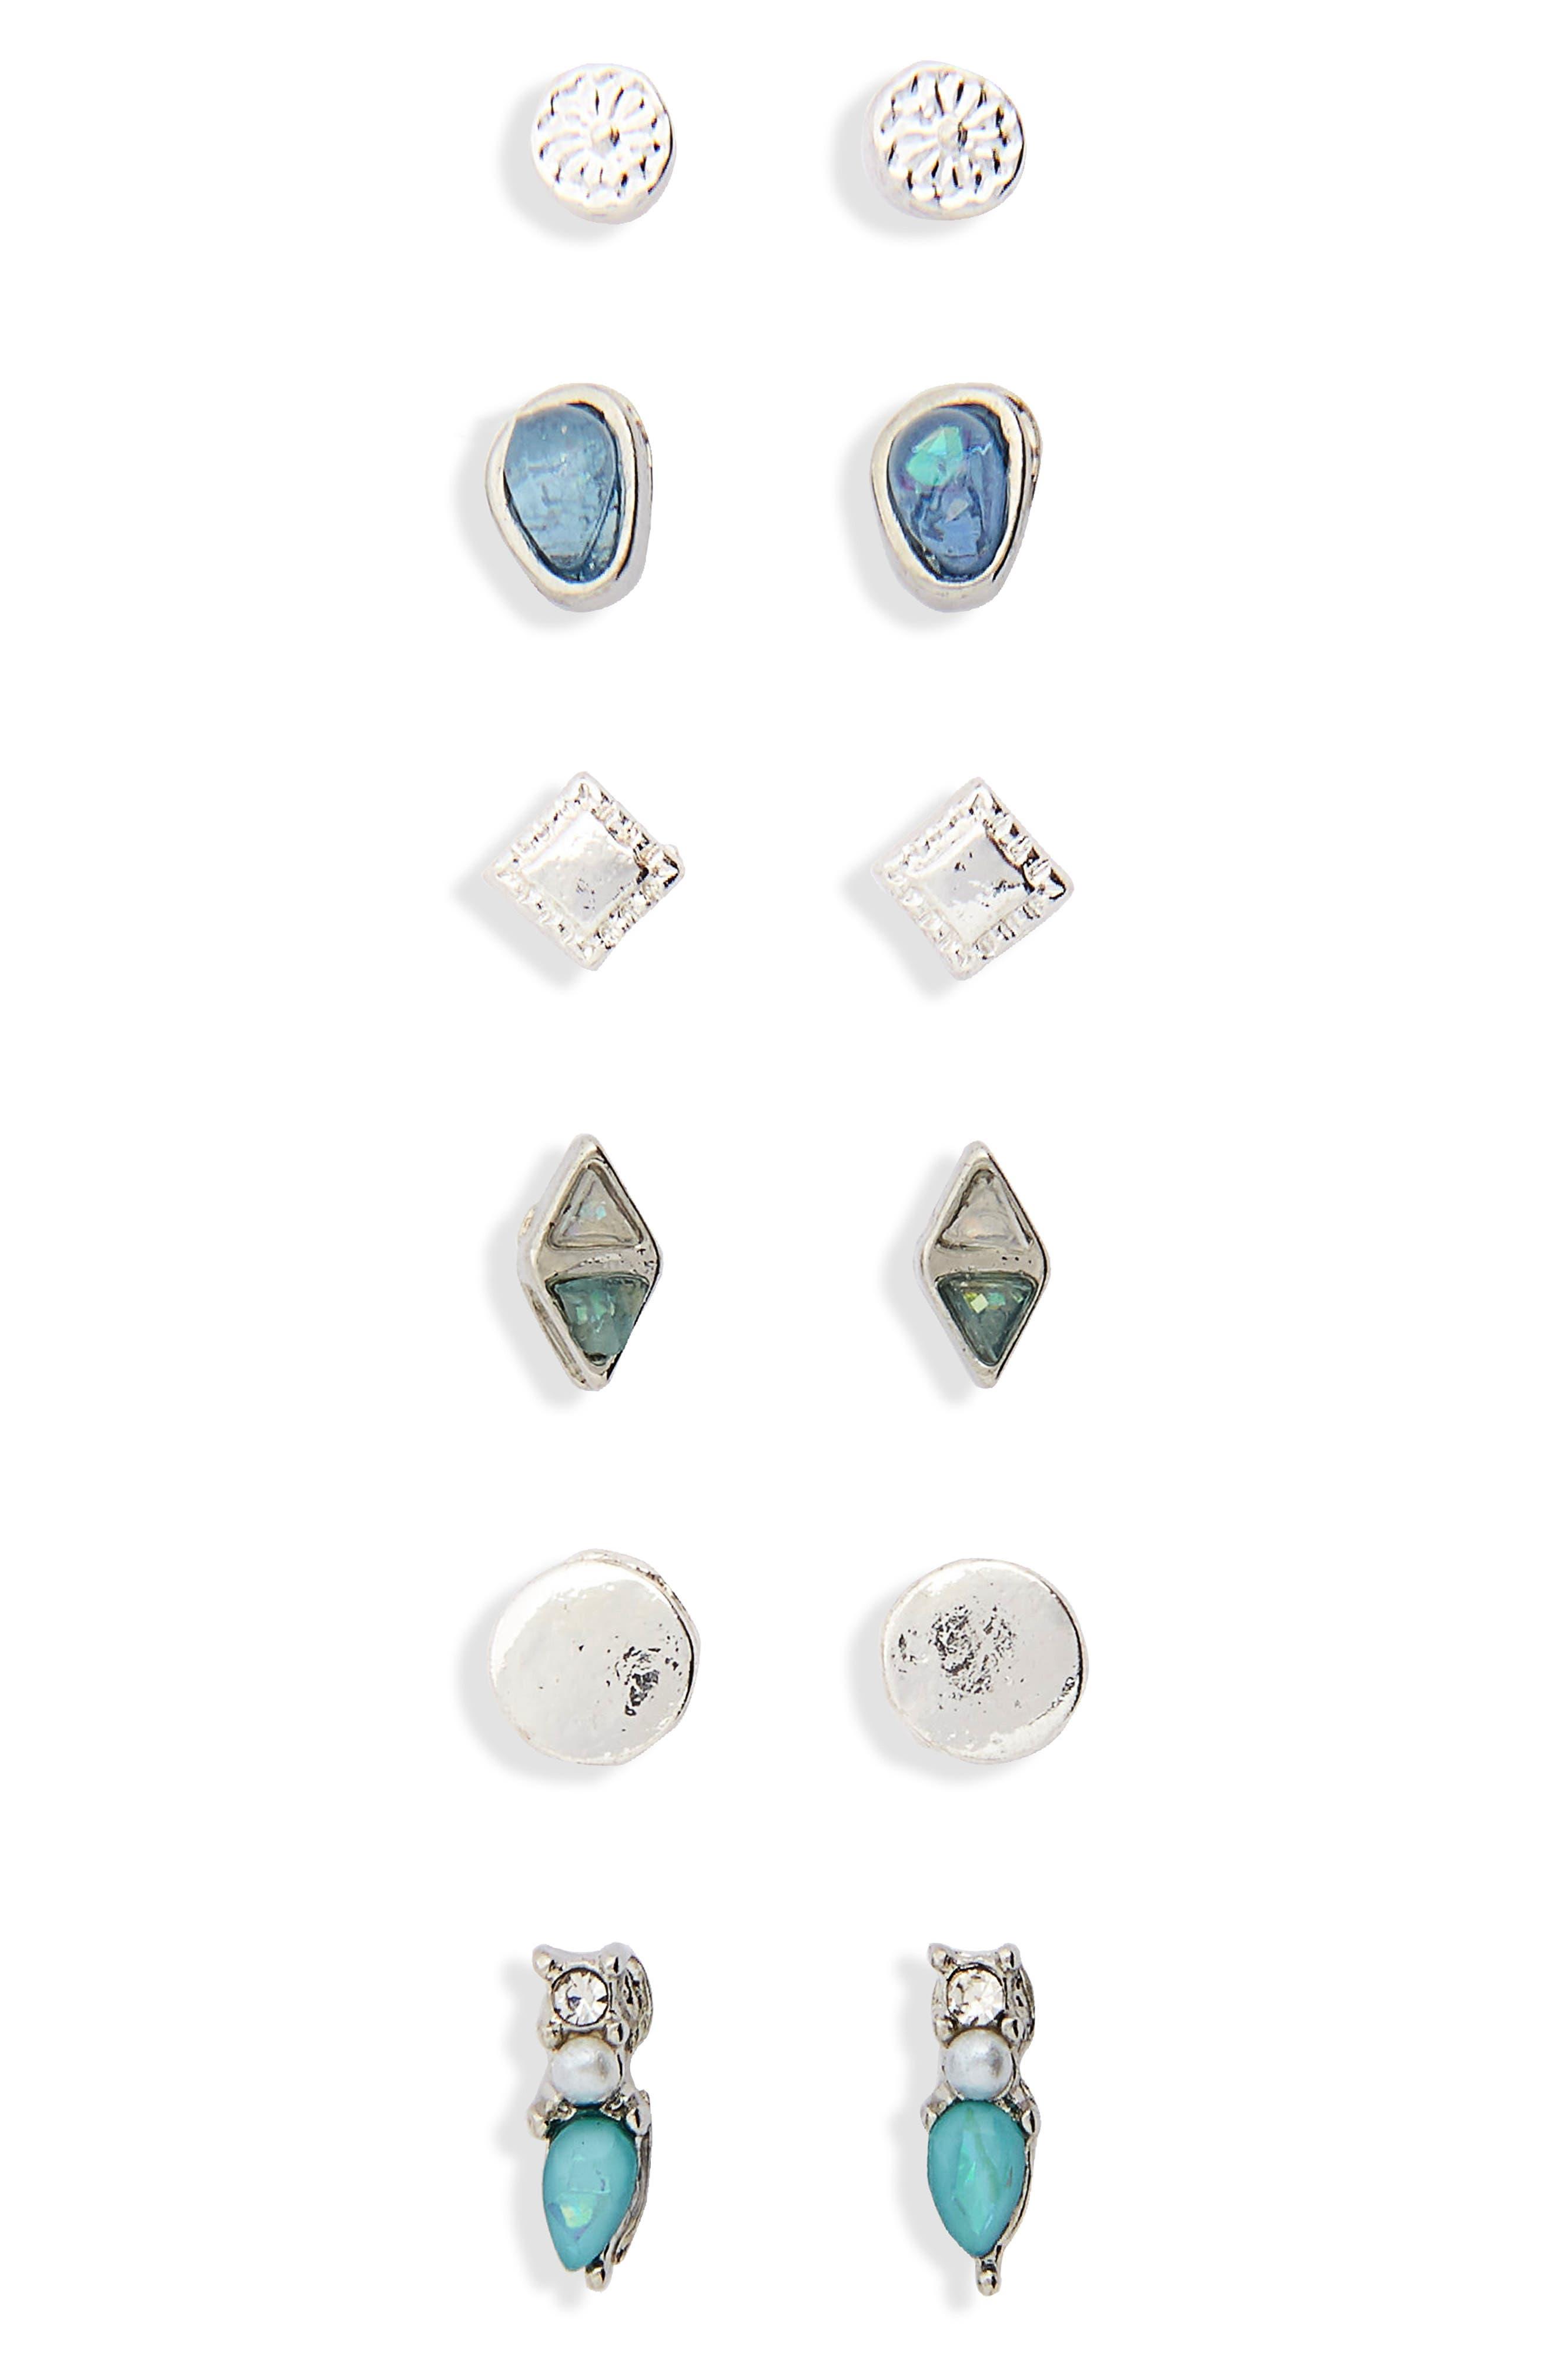 6-Pack Dainty Stone Stud Earrings,                             Main thumbnail 1, color,